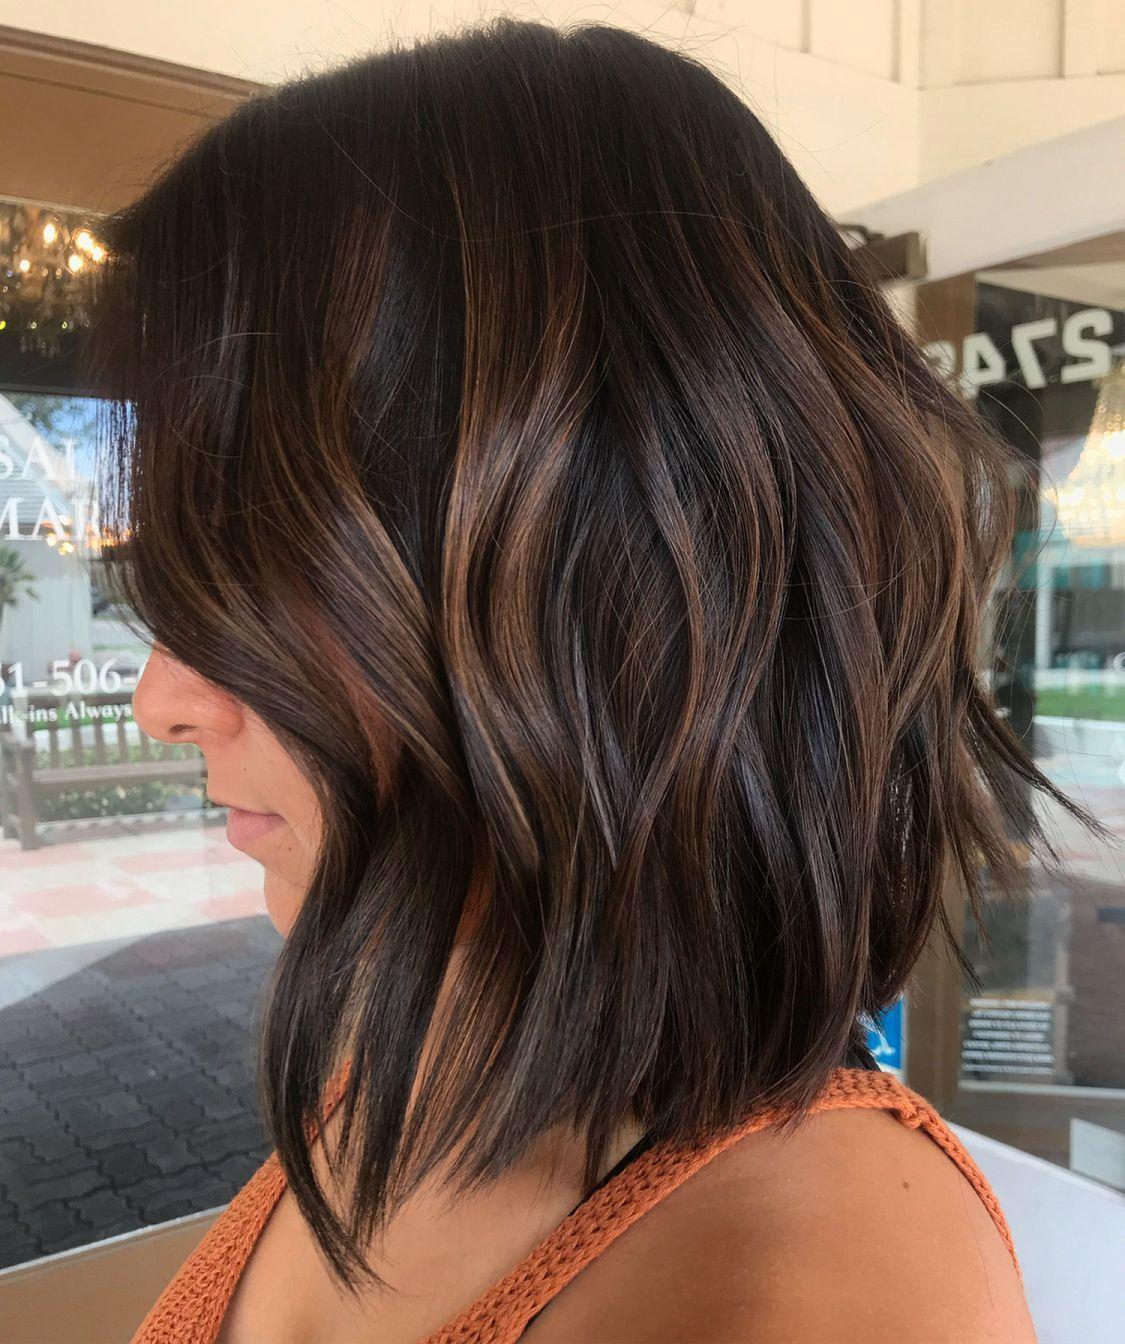 Subtle Brown Balayage Hair Short Hair Balayage Brown Hair With Highlights Hair Styles